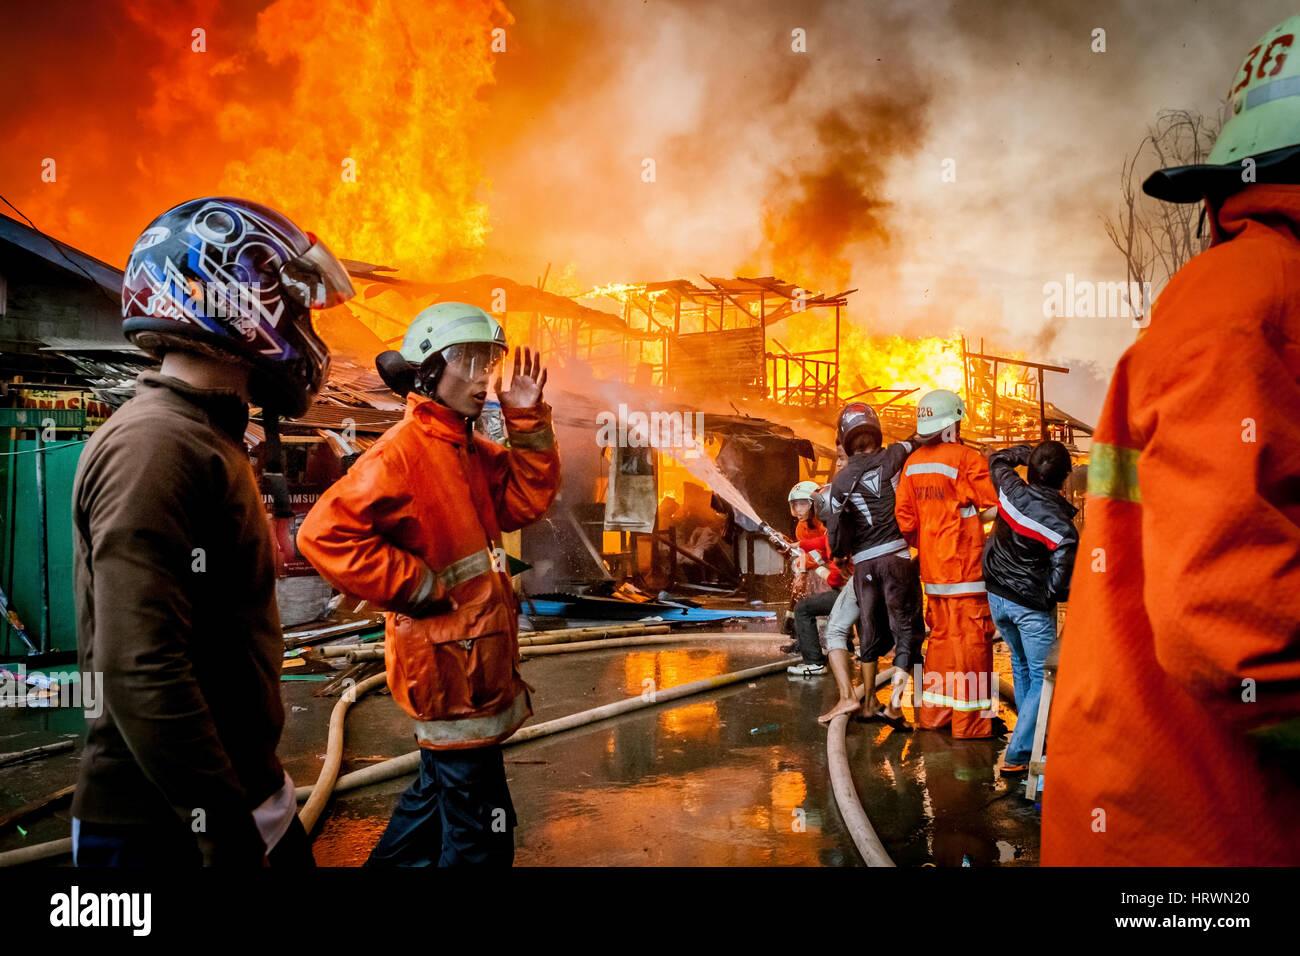 Firemen working in a dense neighborhood in Jakarta, Indonesia. © Reynold Sumayku - Stock Image